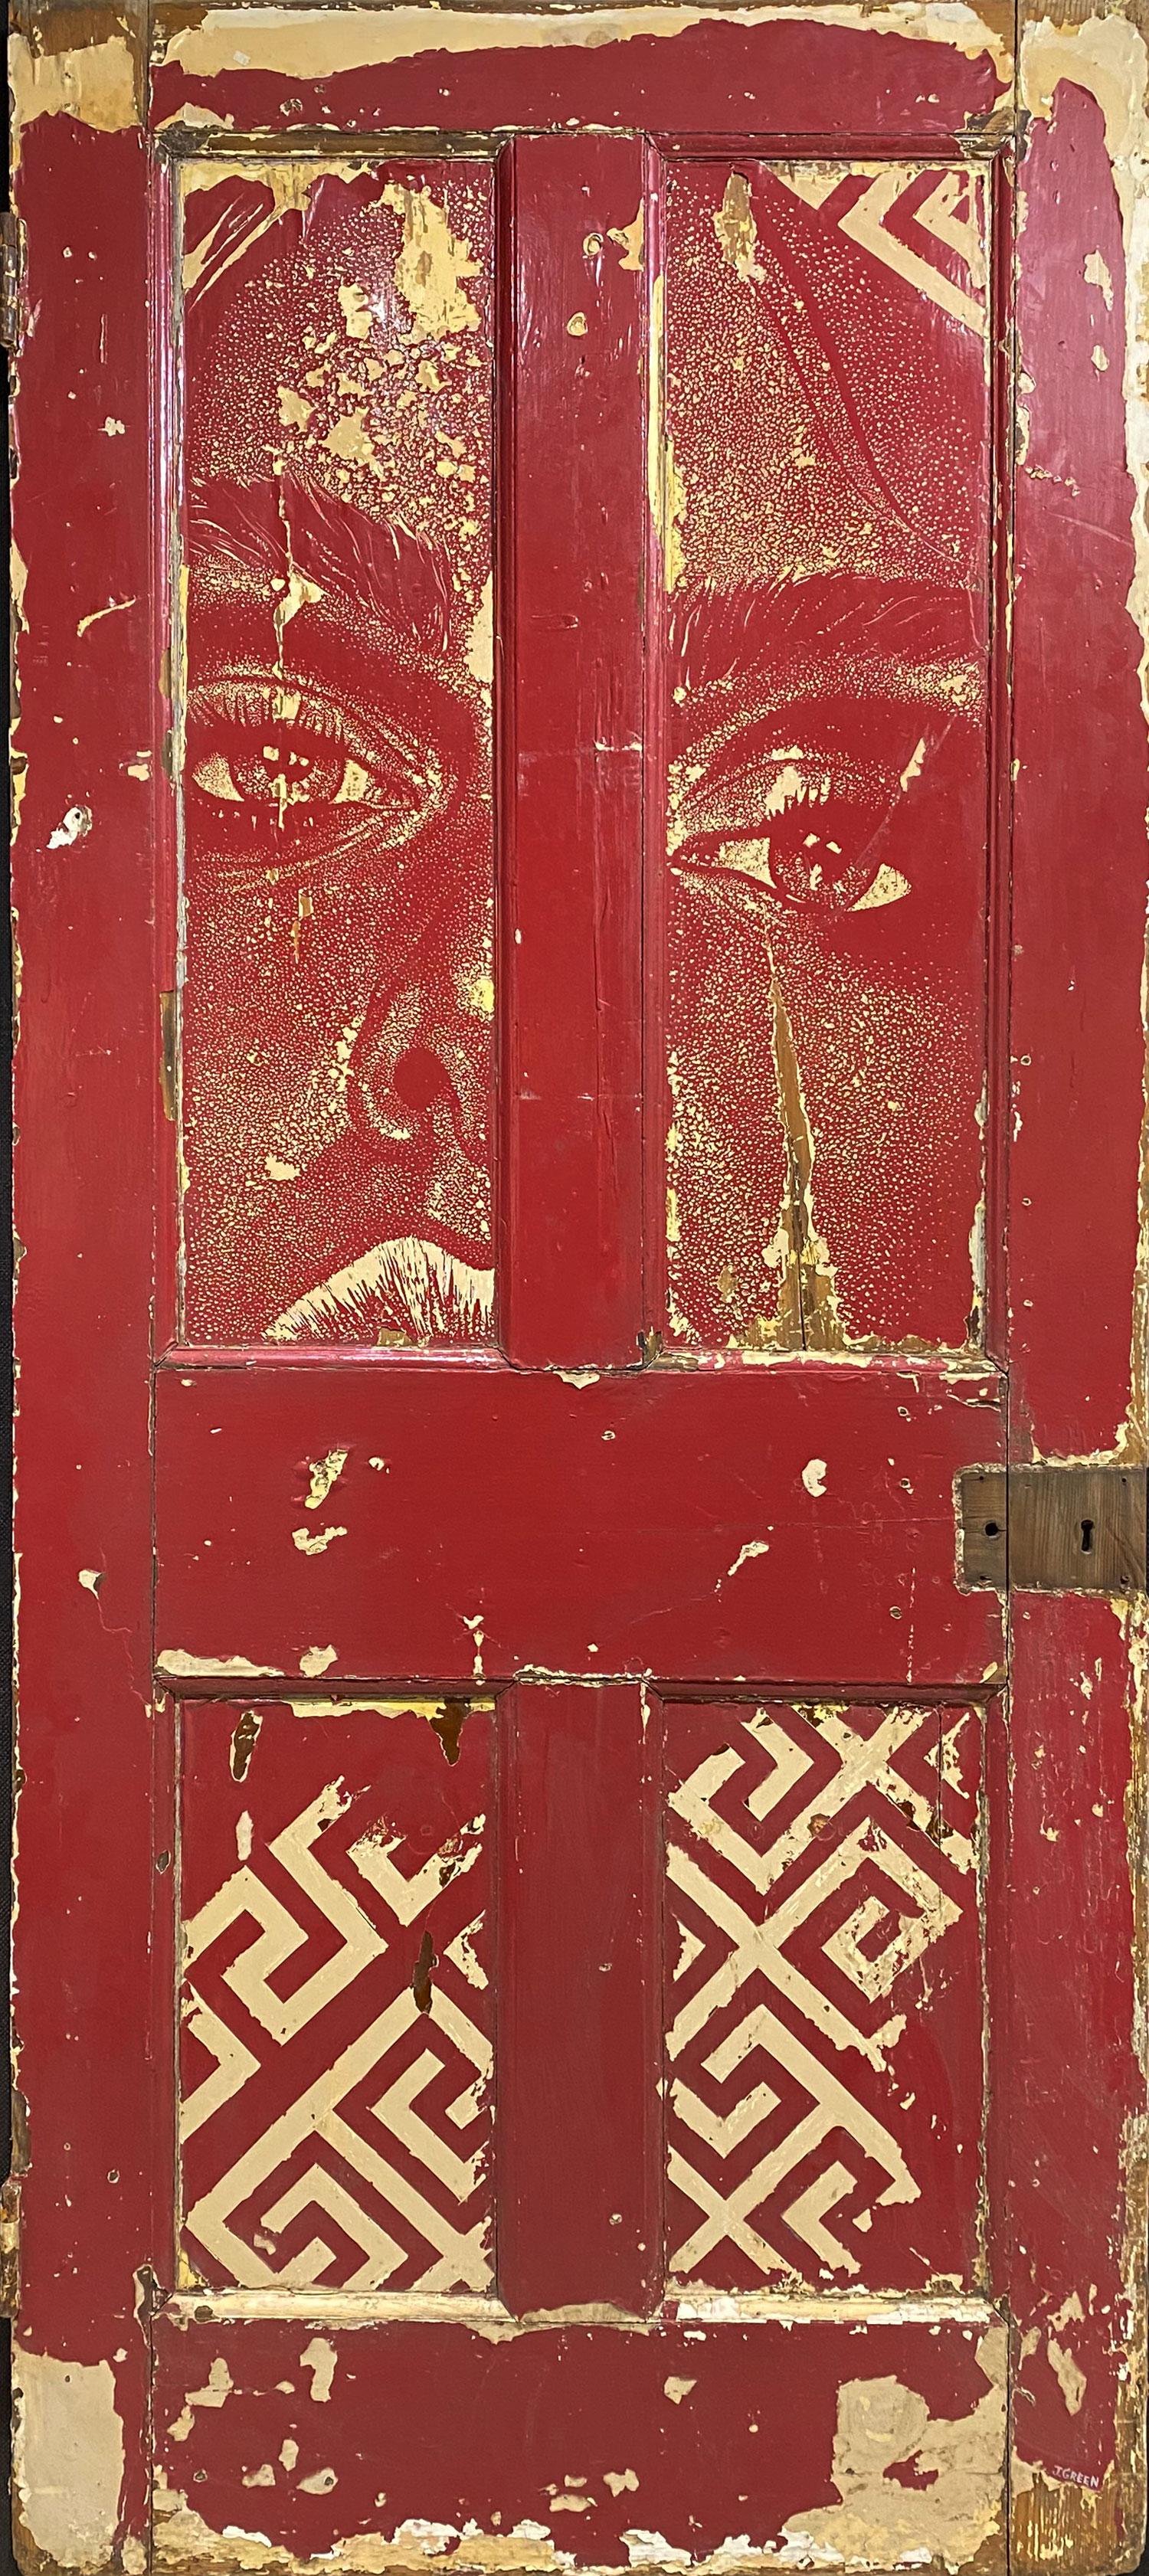 Jamie Green Artist - Keep Closed